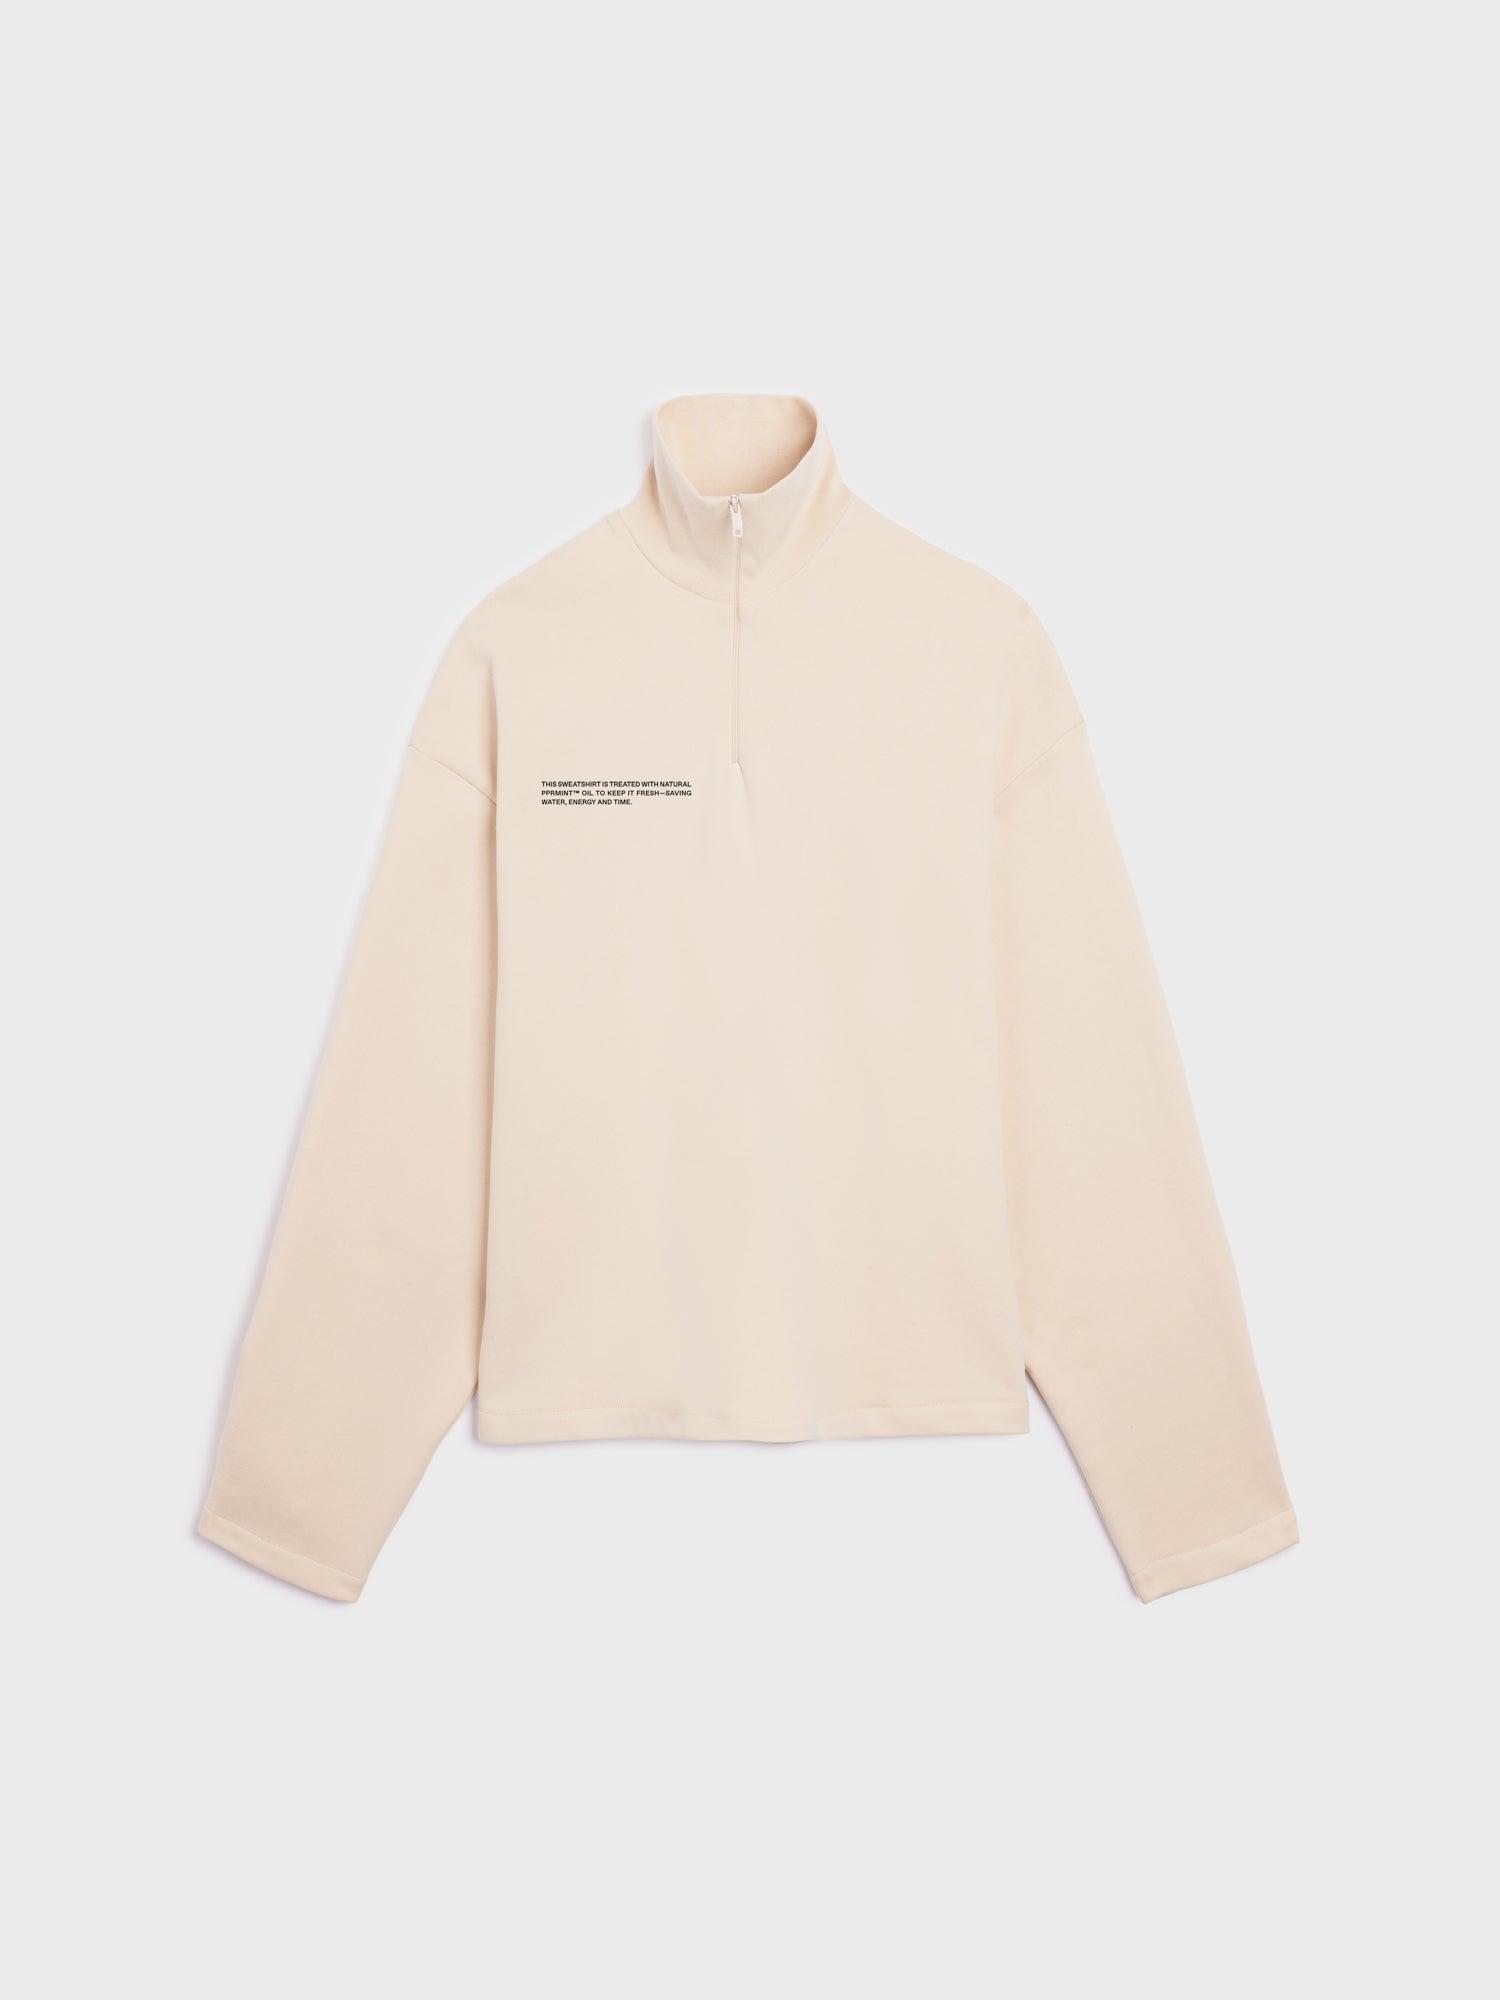 Pangaia Women's PPRMINT™ Half Zip Sweatshirt